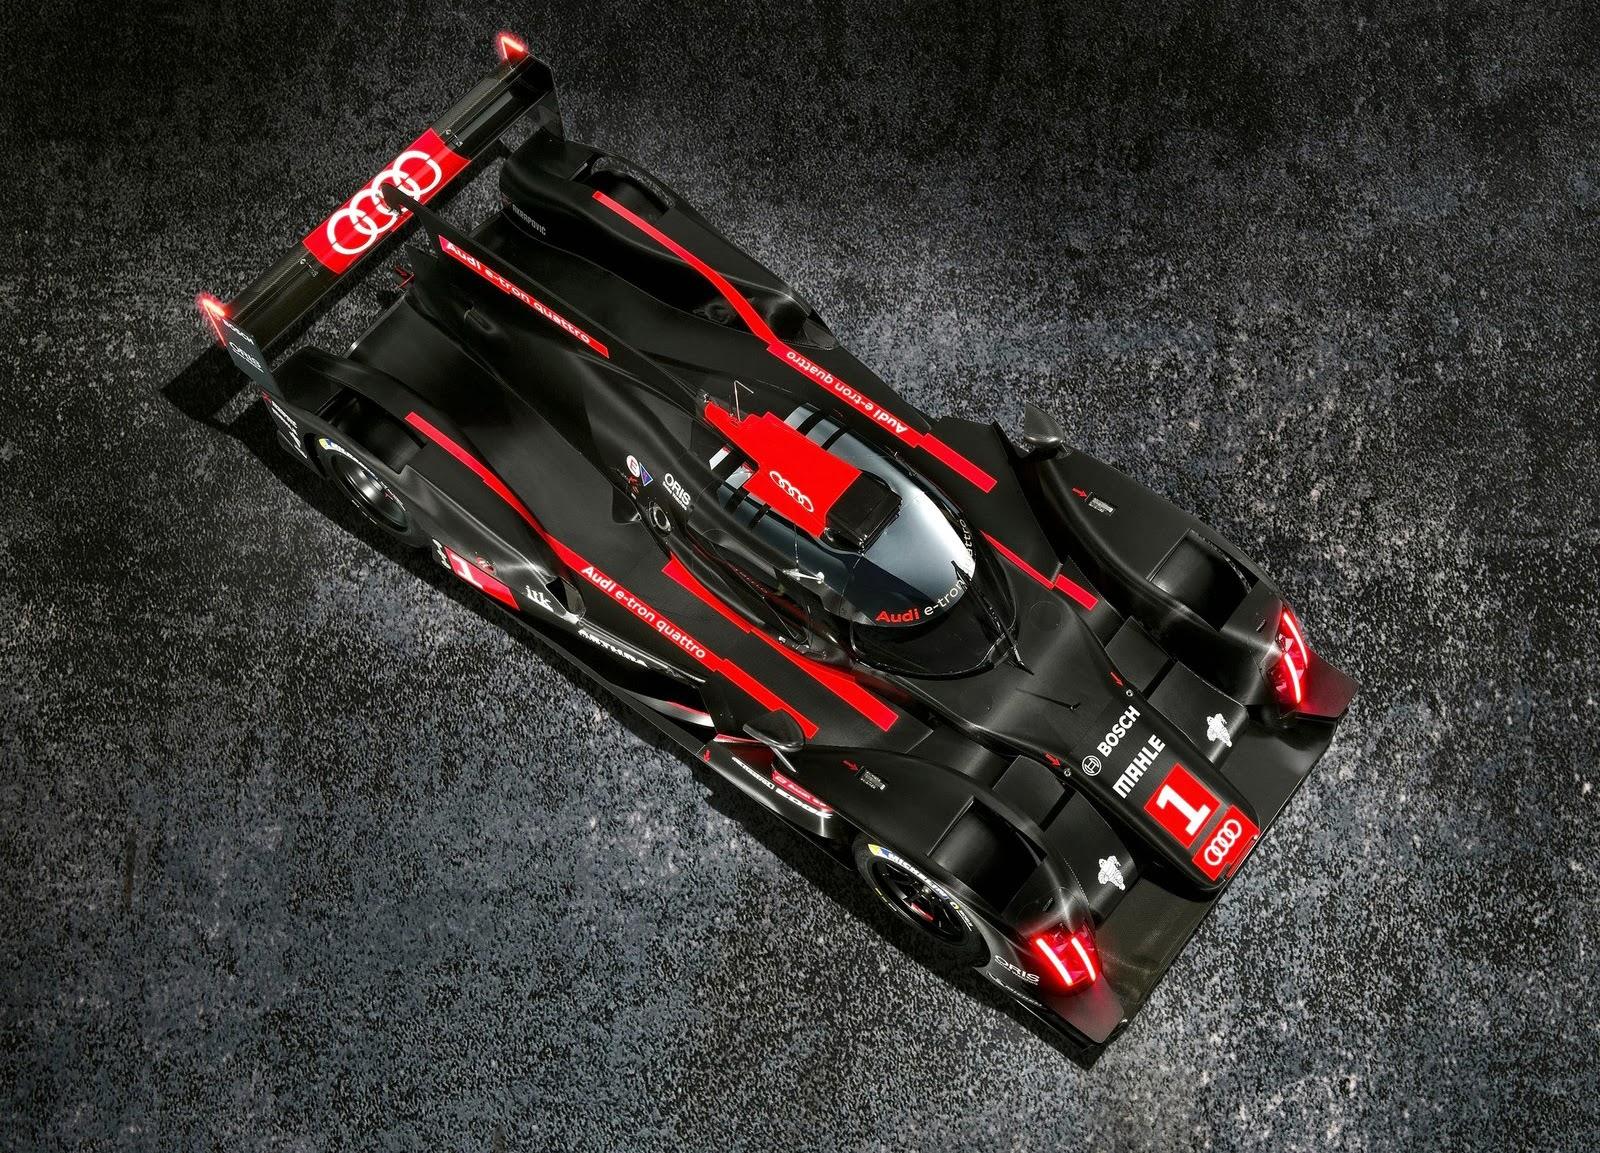 2014+Audi+R18+e tron+quattro+LMP1+Racecar+(2) Audi R18 e tron quattro LMP1 Racecar